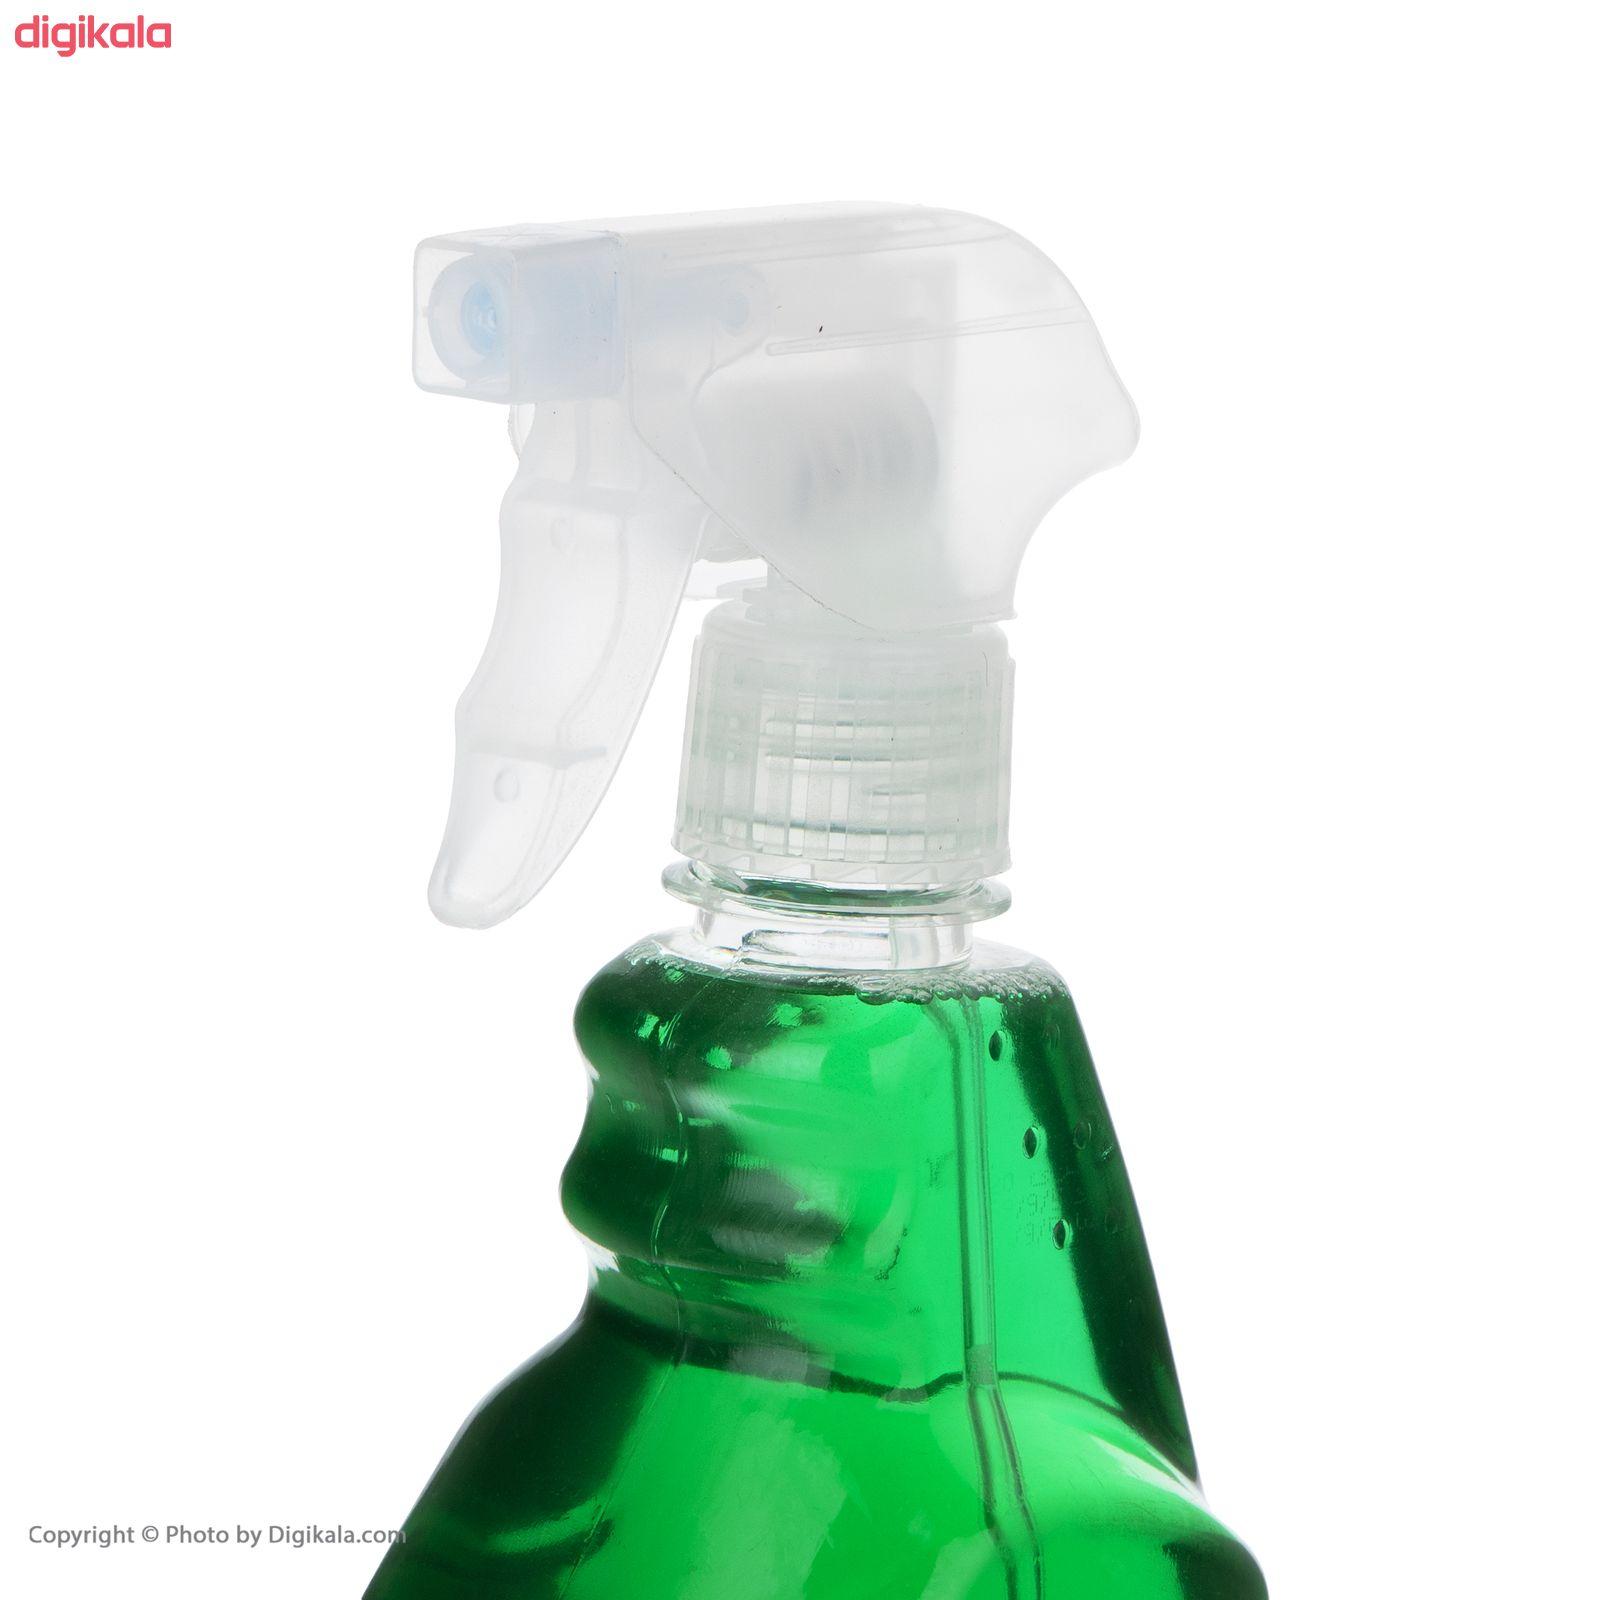 شیشه پاک کن من کد 01 حجم 1 لیتر مجموعه 2 عددی  main 1 21